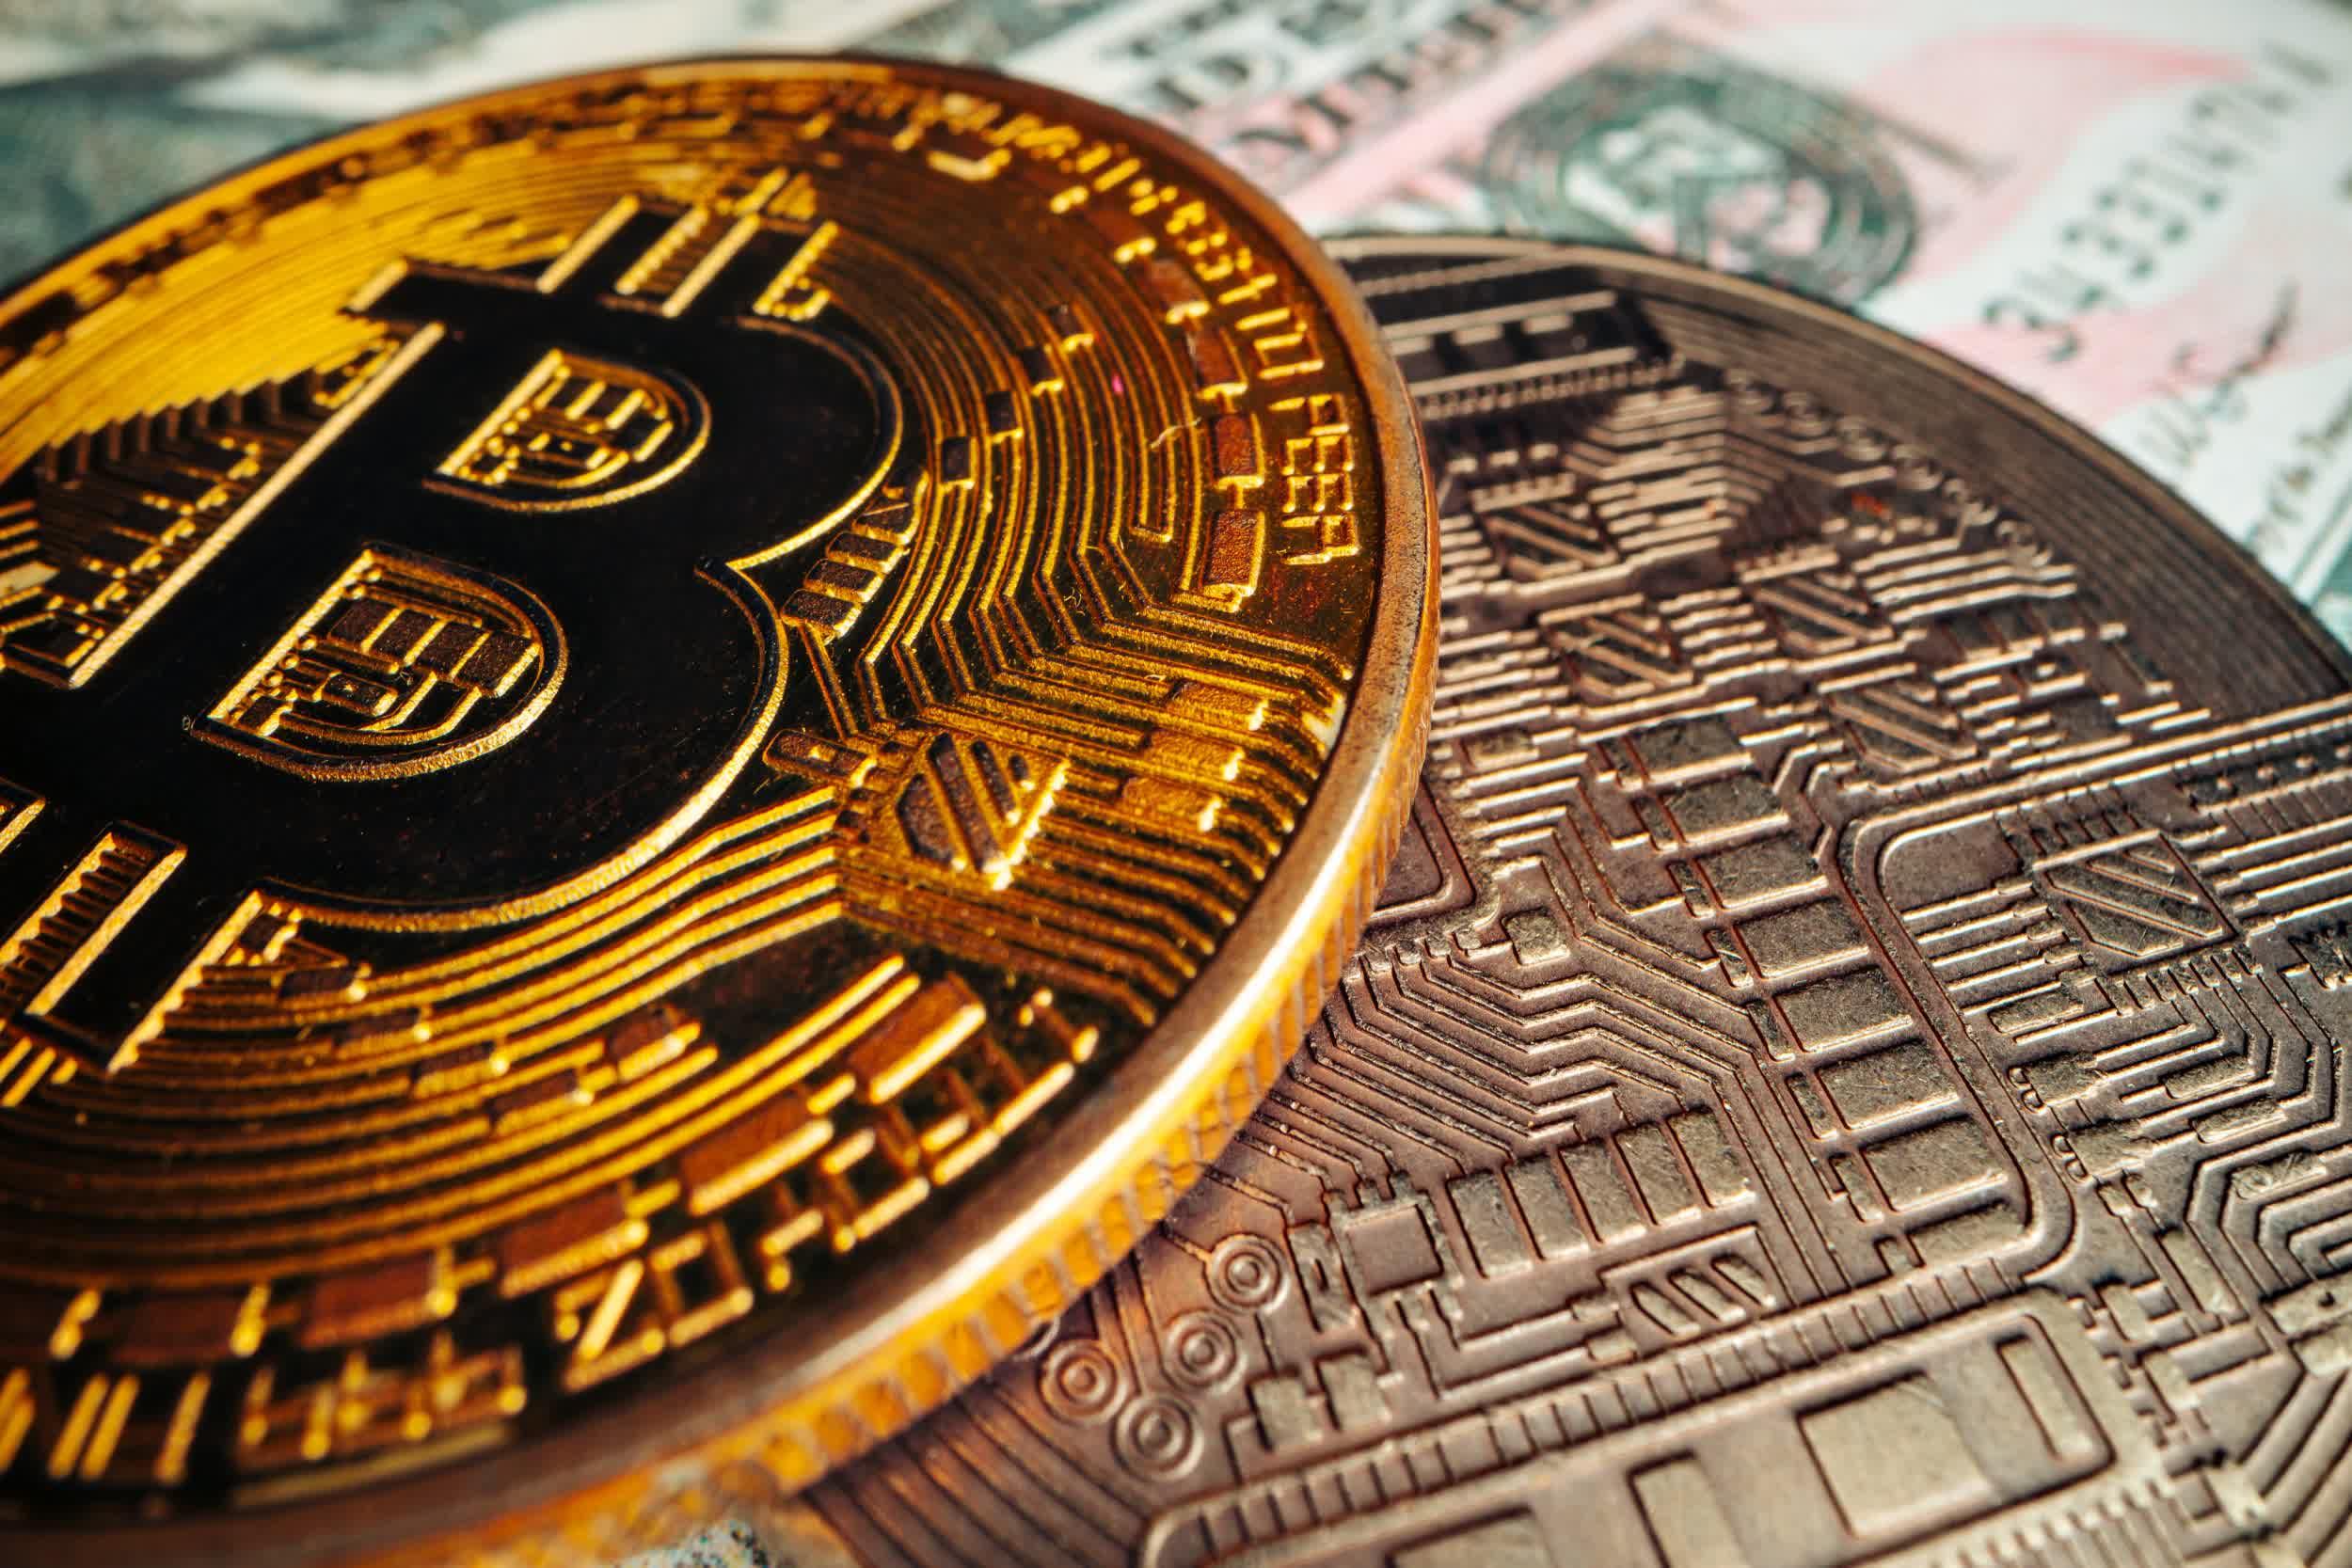 Les cinemas AMC commenceront a accepter Bitcoin dici la fin